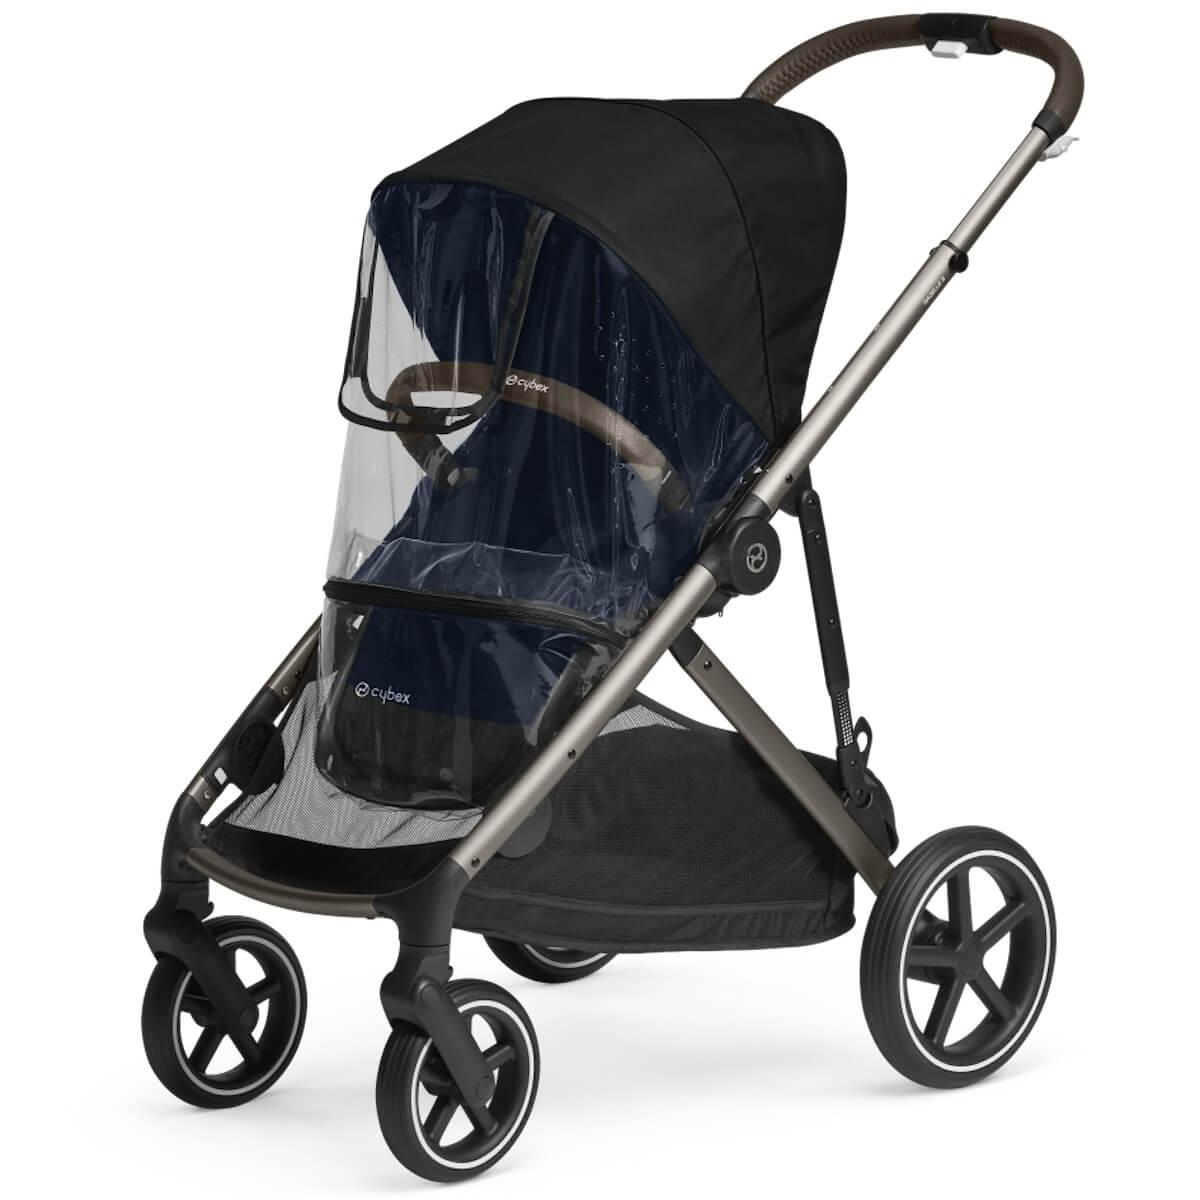 Kinderwagen Regenschutz GAZELLE S Cybex